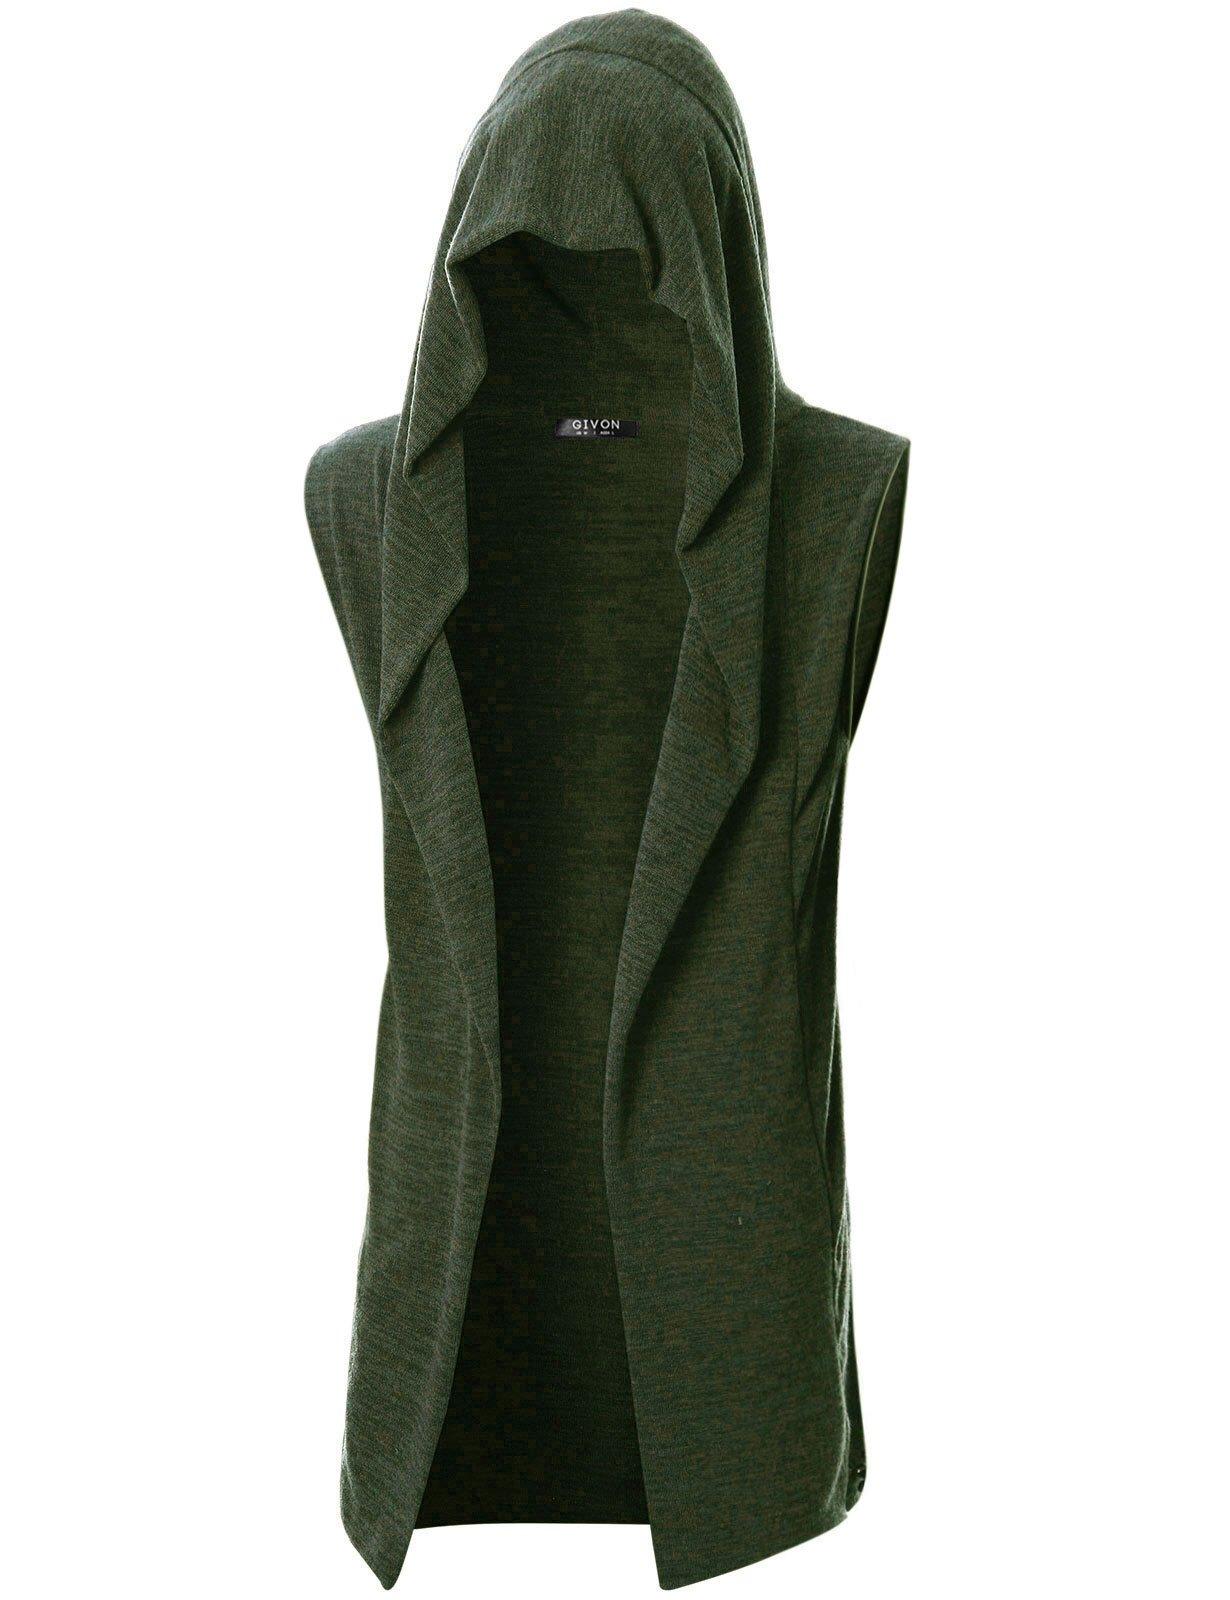 GIVON Mens Sleeveless Lightweight Ruffle Shawl Collar Cardigan with Pockets/DCC046-KHAKI-M